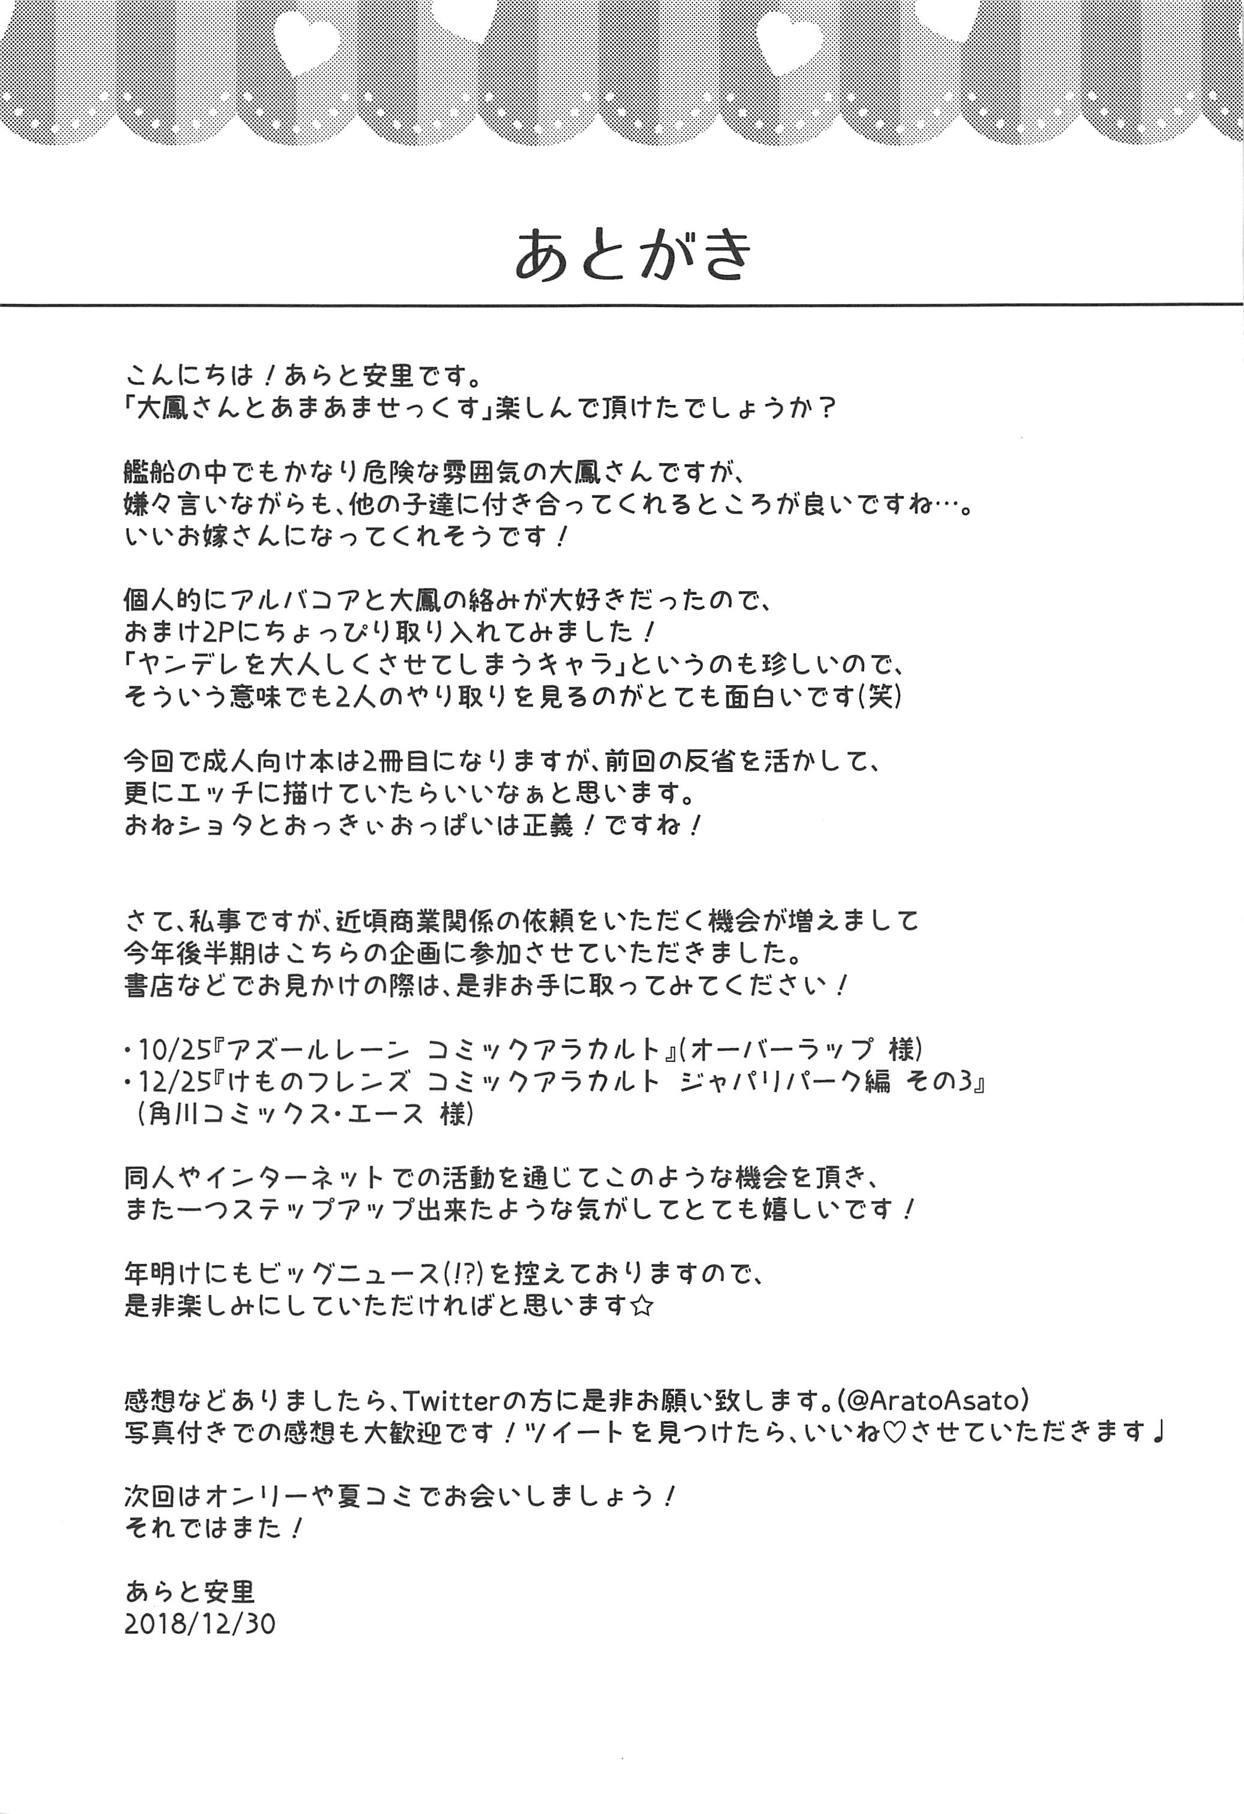 (C95) [Aratoya (Arato Asato)] Taihou-san to Amaama Sex - sweetest sex with taihou-san (Azur Lane) [Chinese] [黎欧x新桥月白日语社] 19